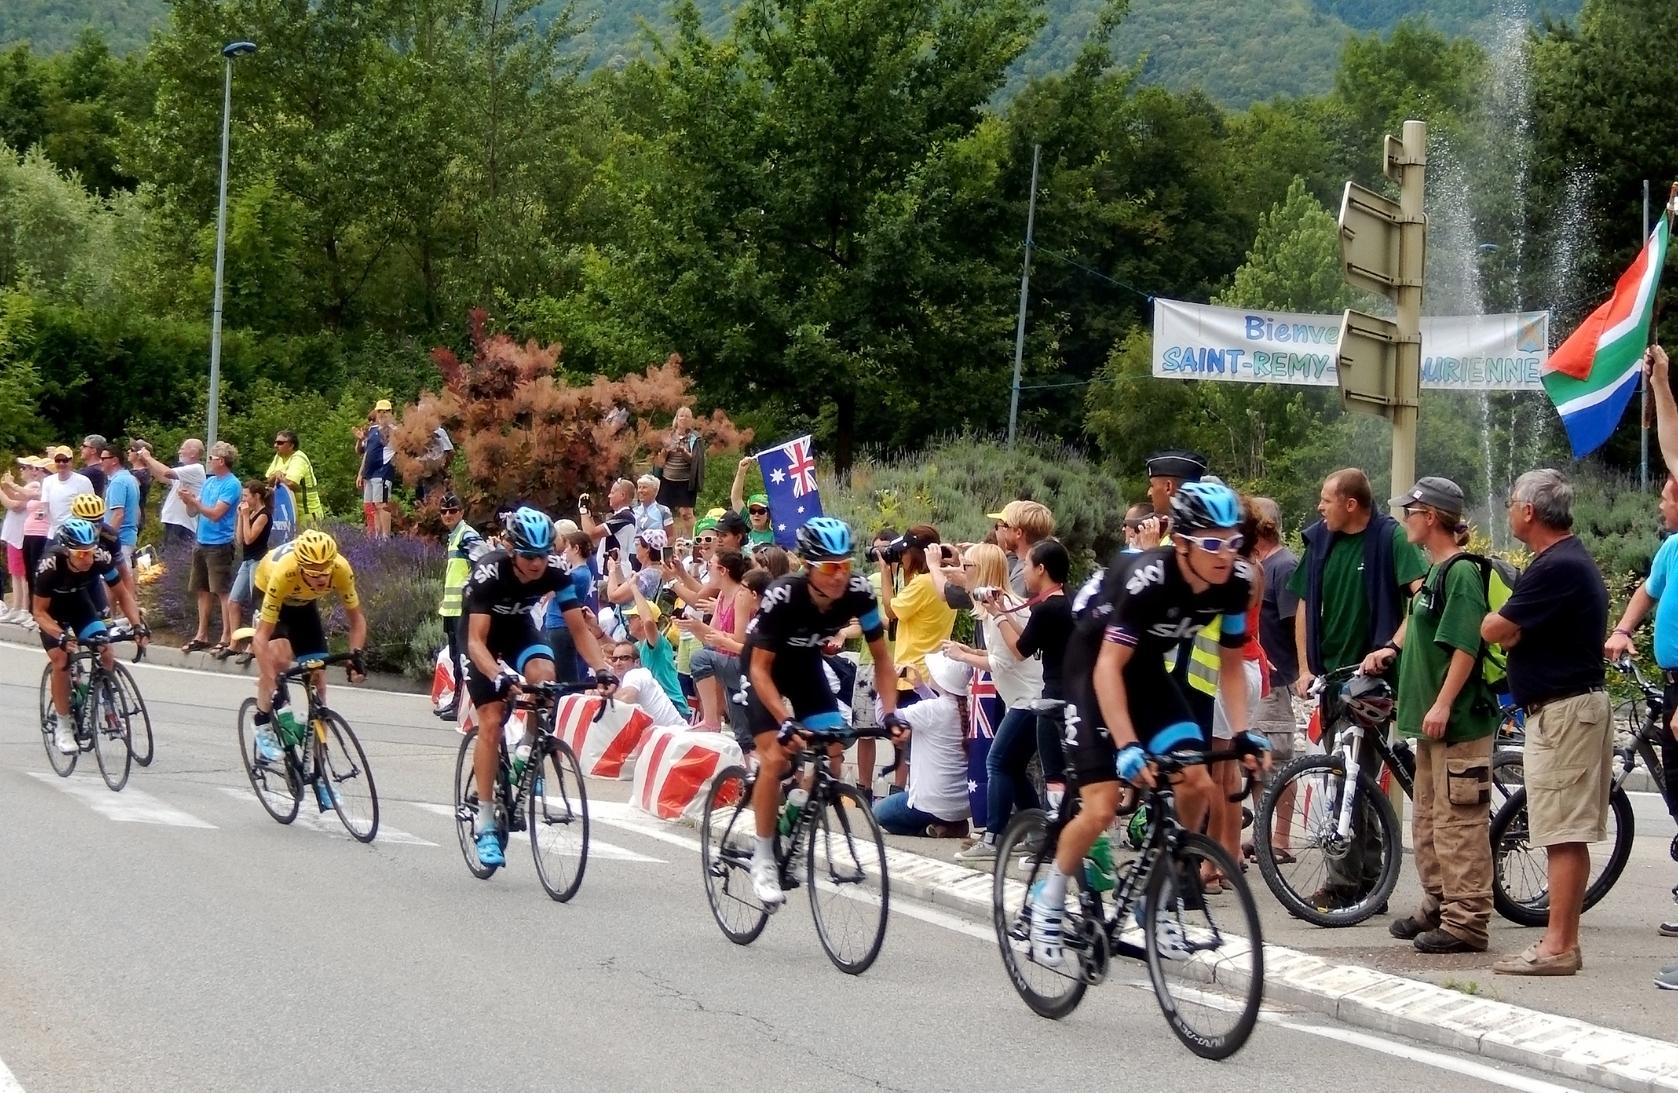 Team Sky at the Tour de France